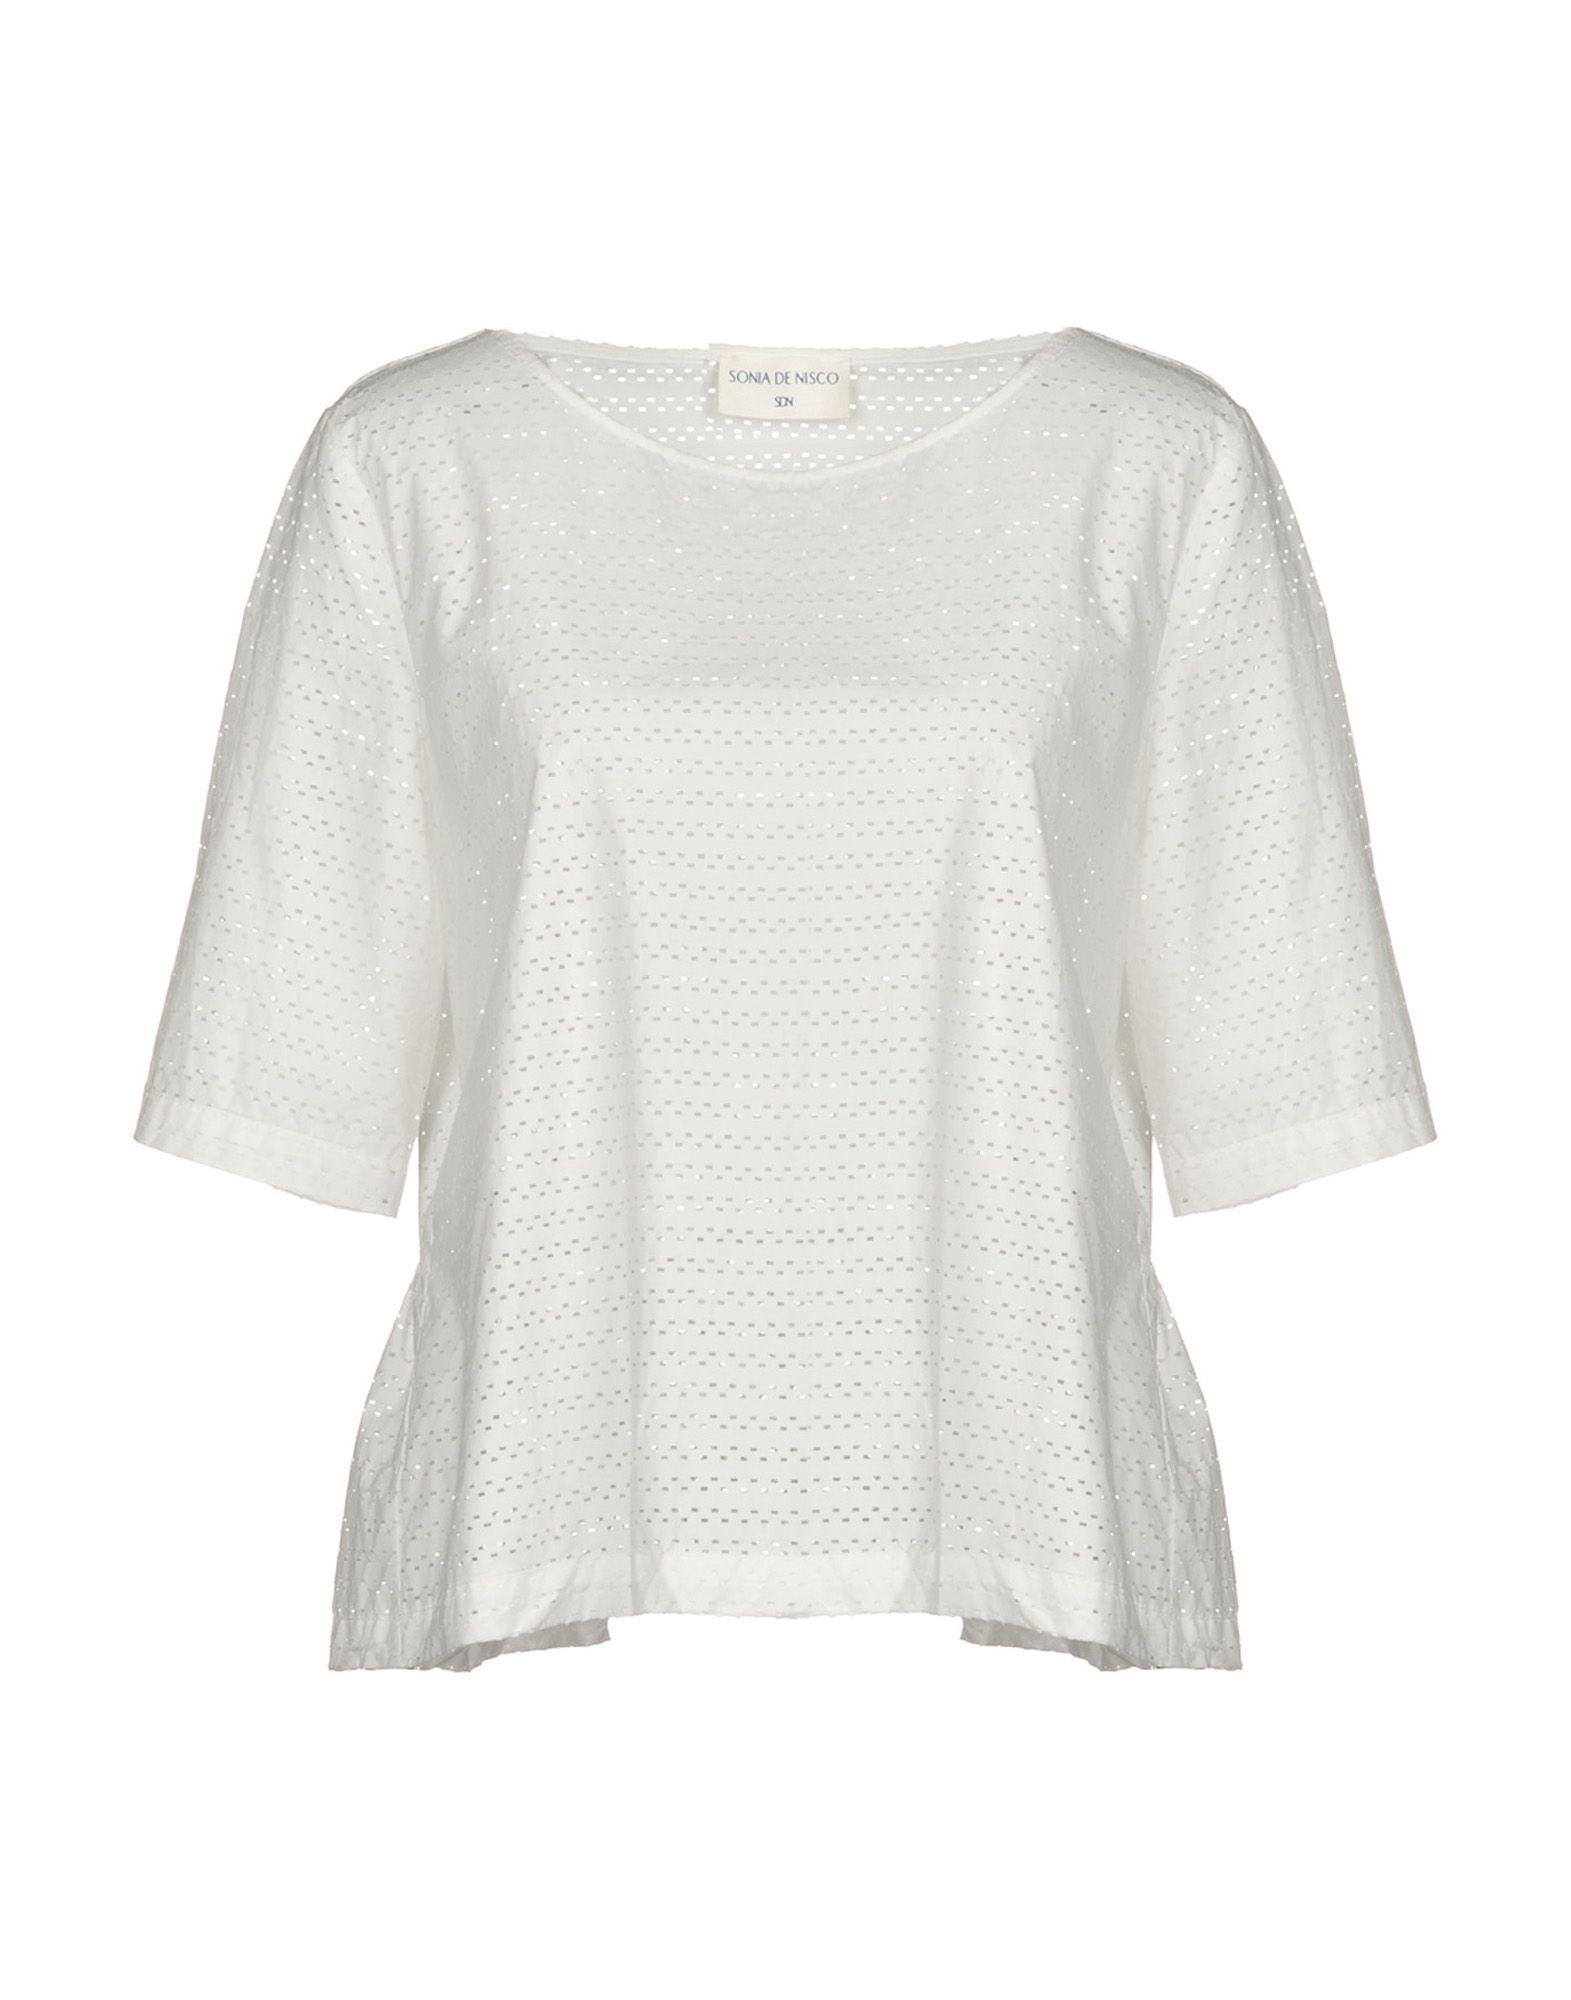 SONIA DE NISCO Блузка ткань